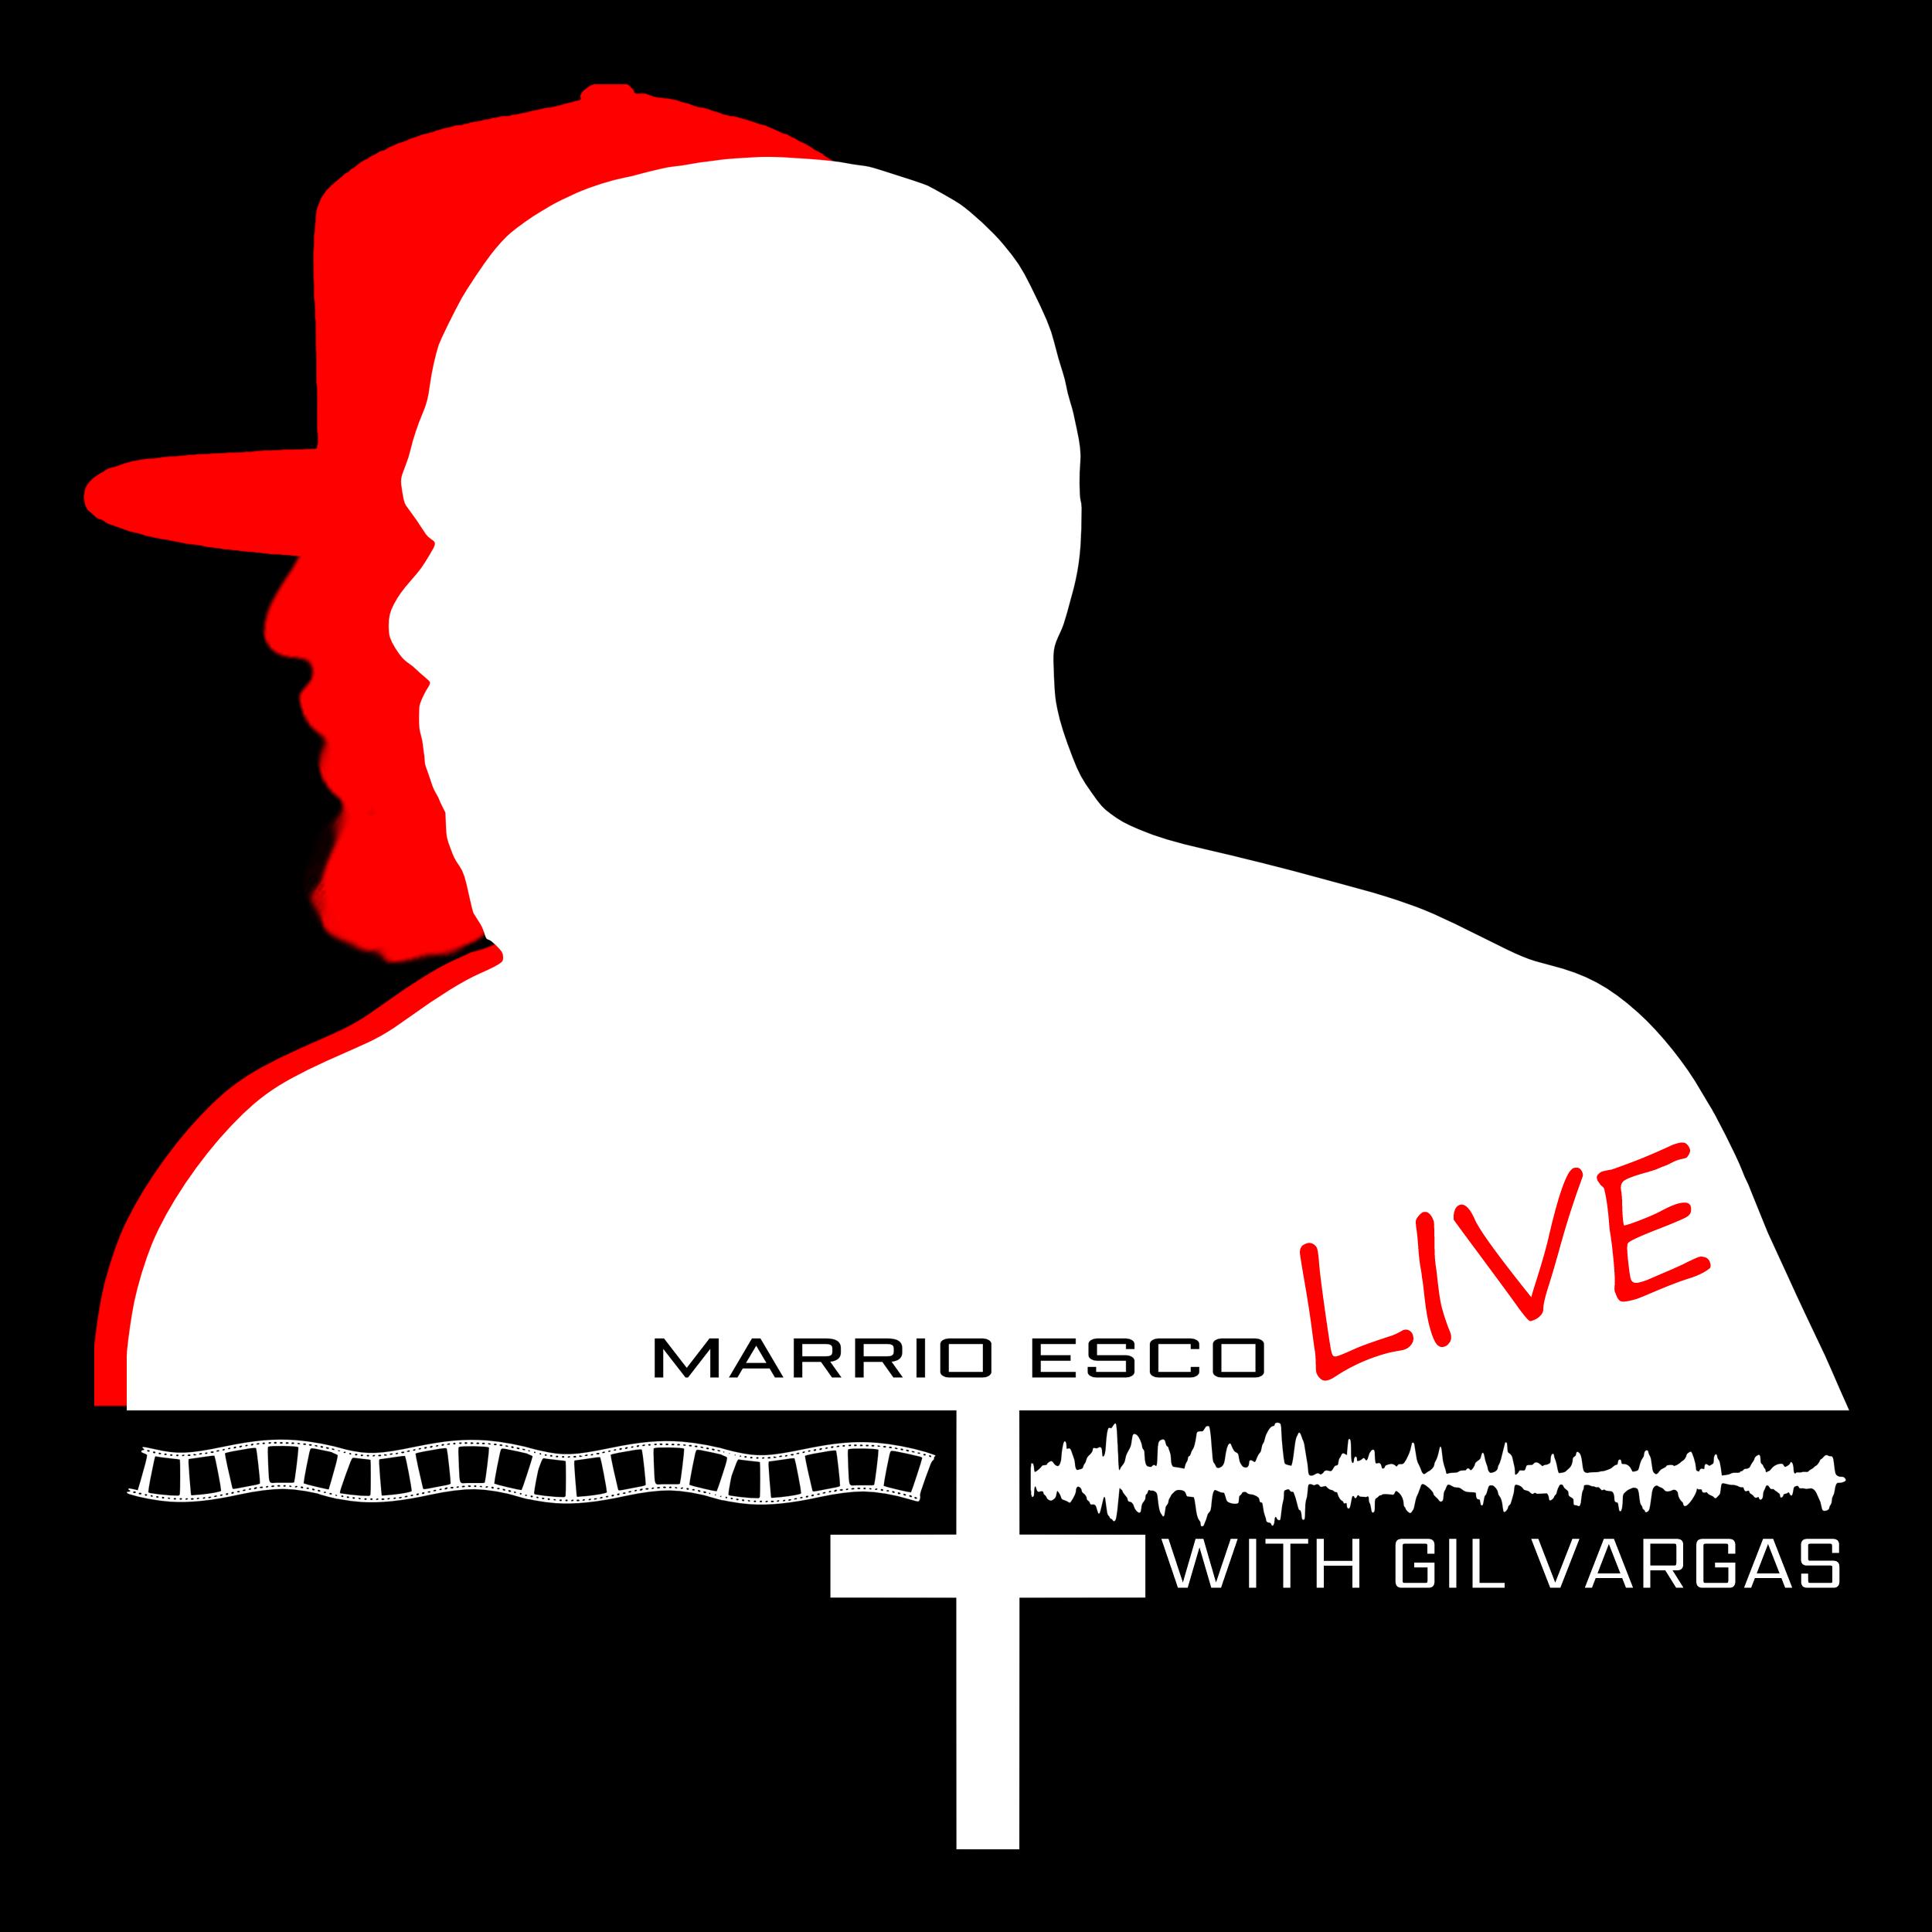 Marrio Esco Live Interview